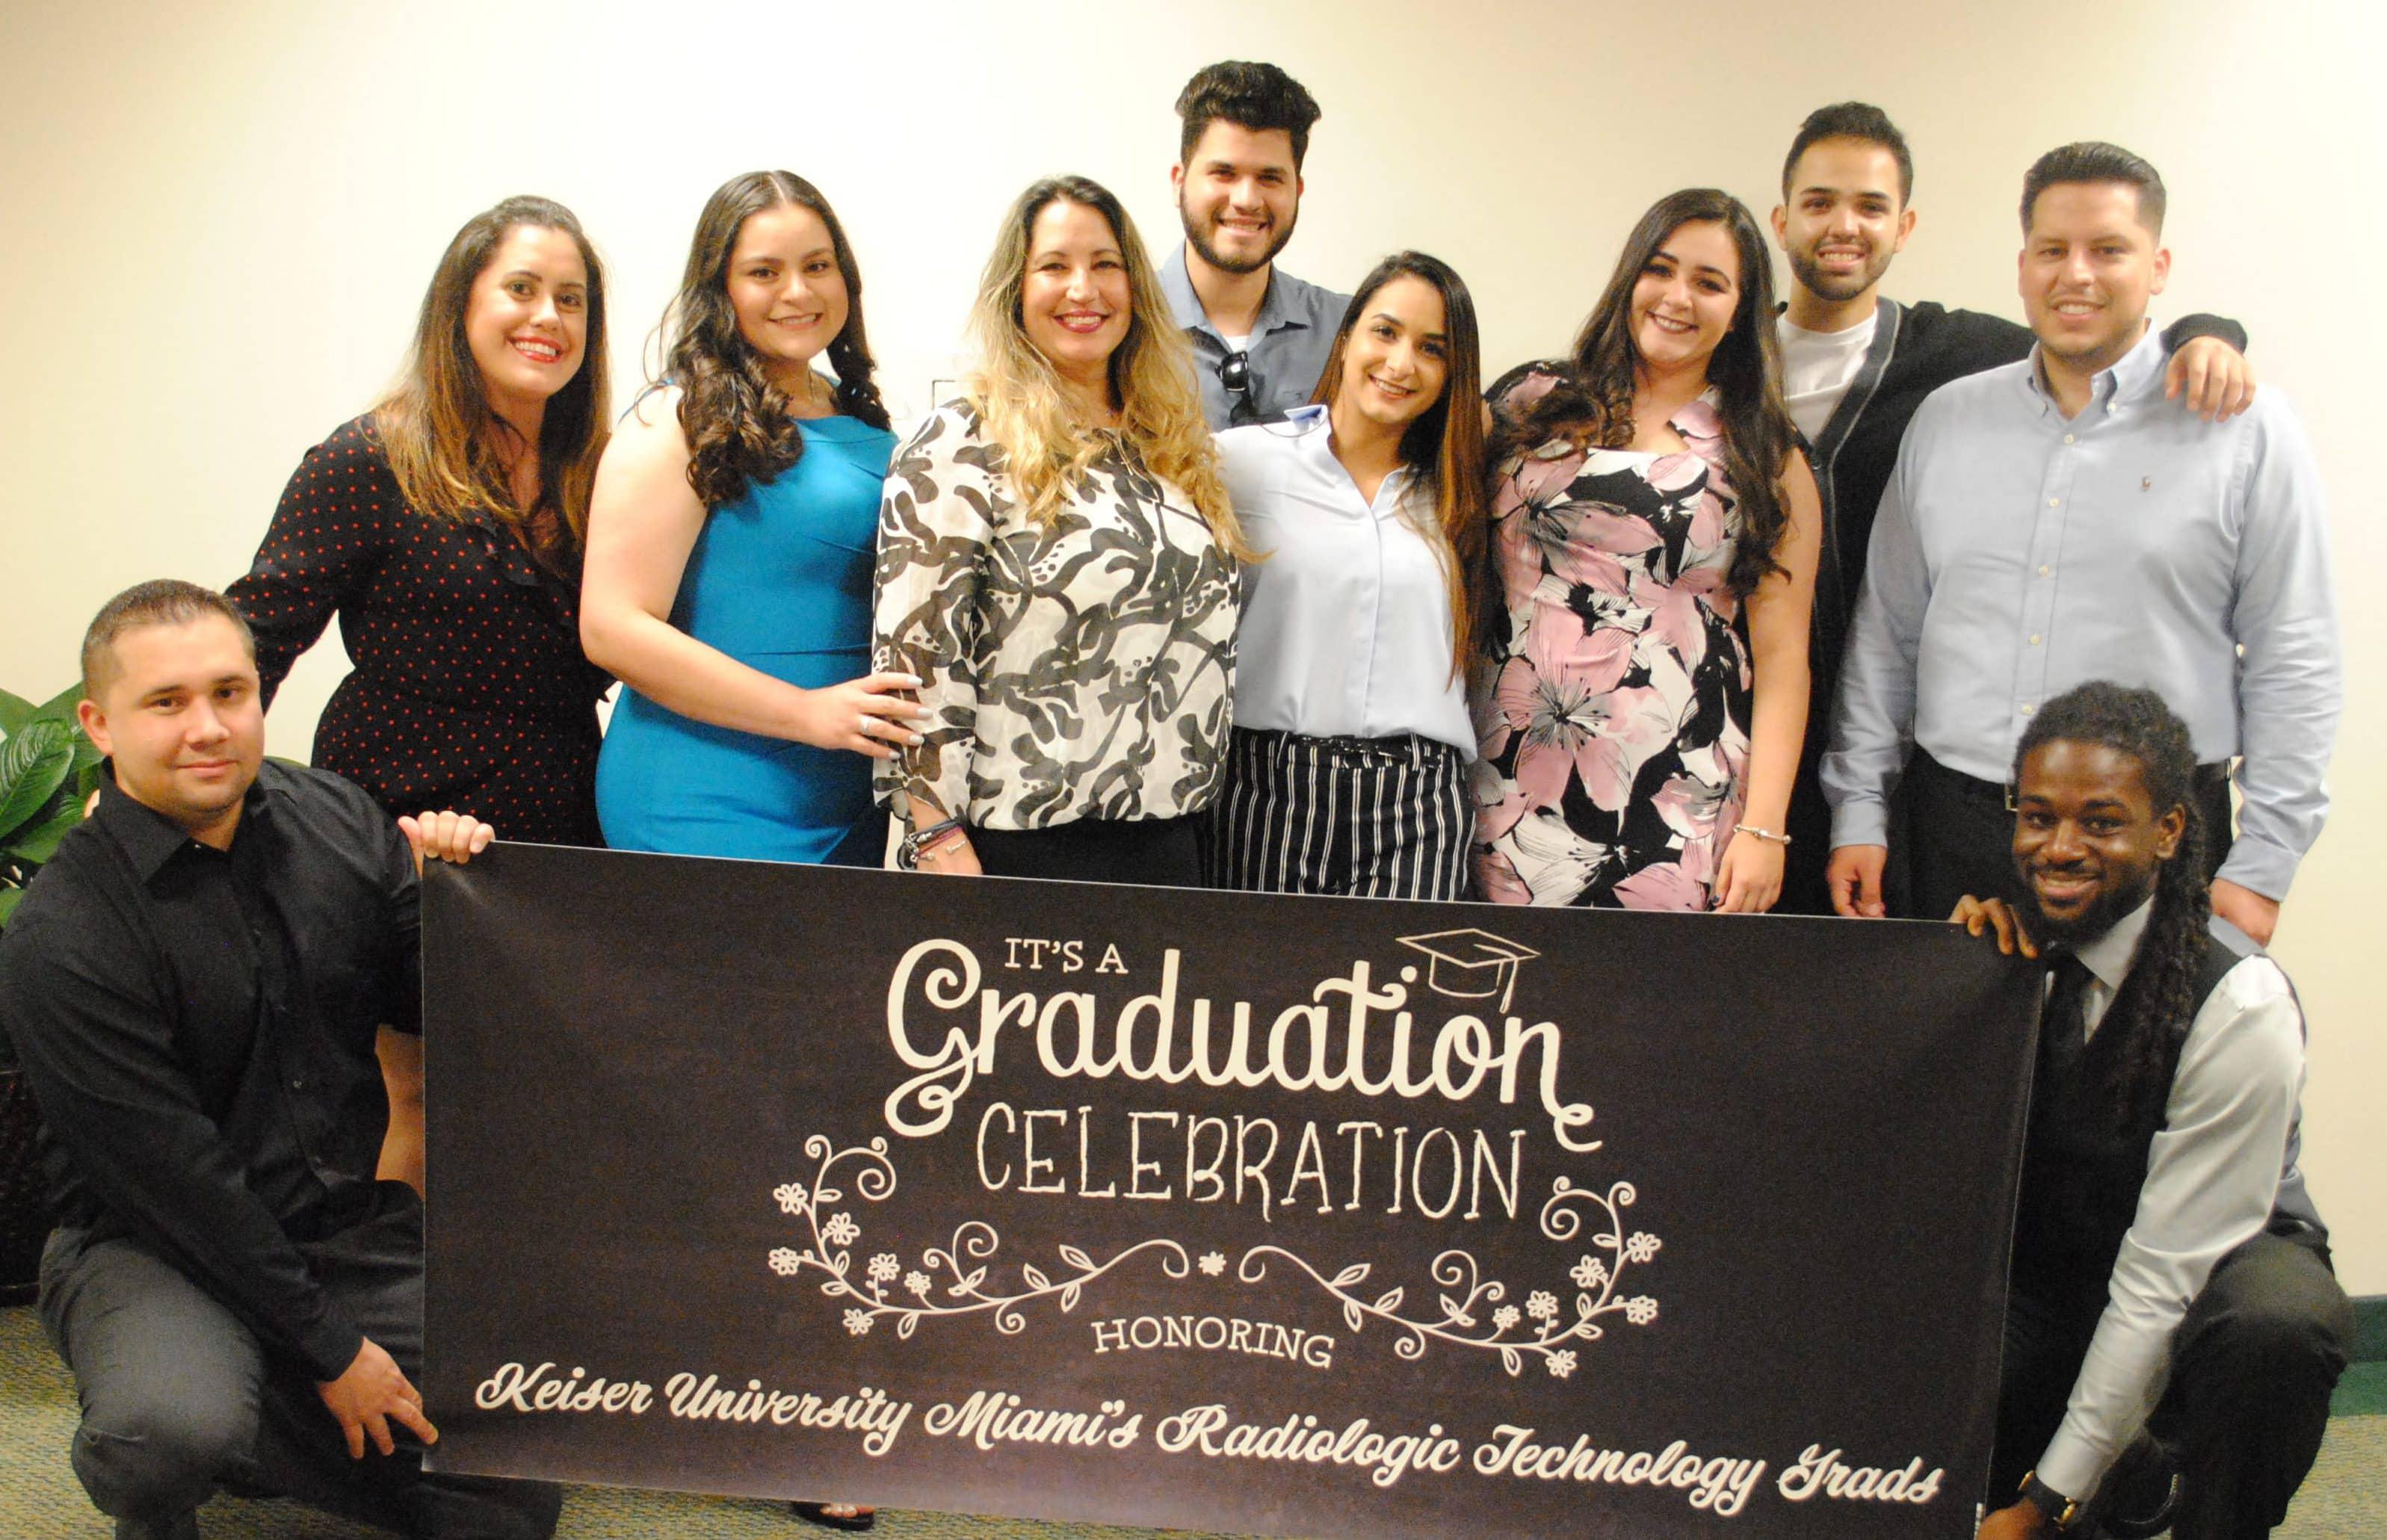 KU-Miami Ceremony Celebrates Radiologic Tech Grads